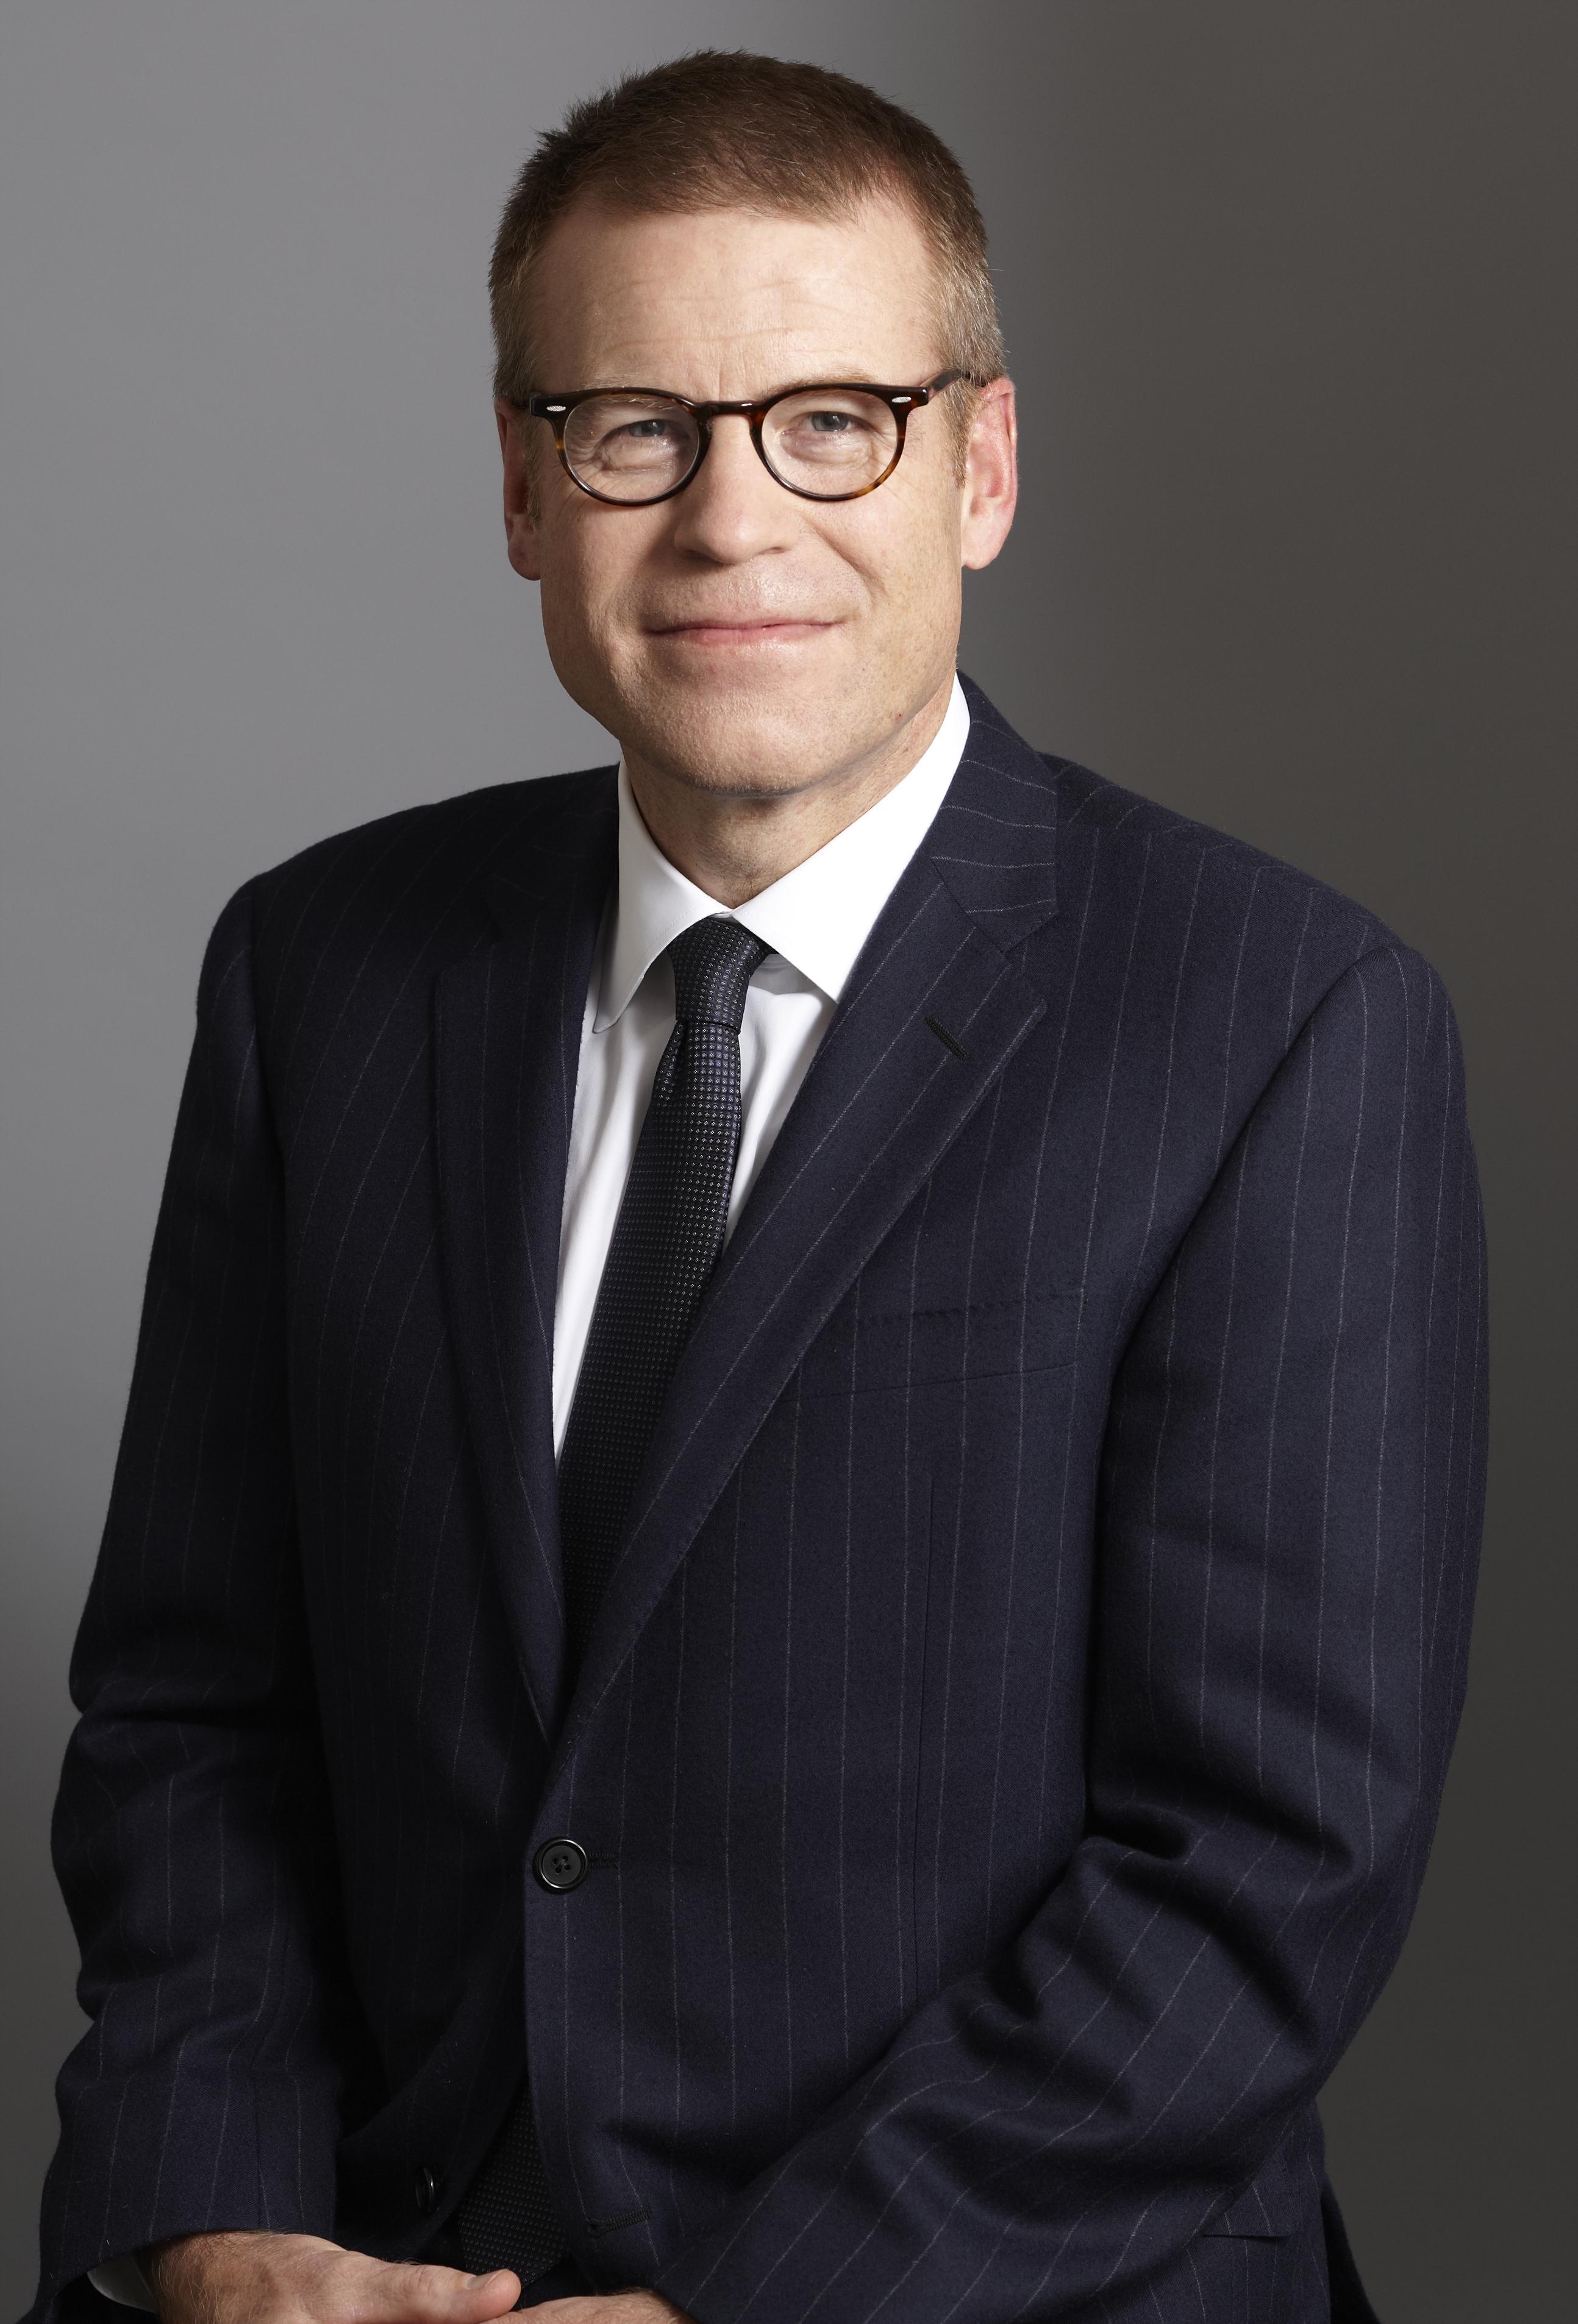 Blake Nordstrom, CEO Nordstrom